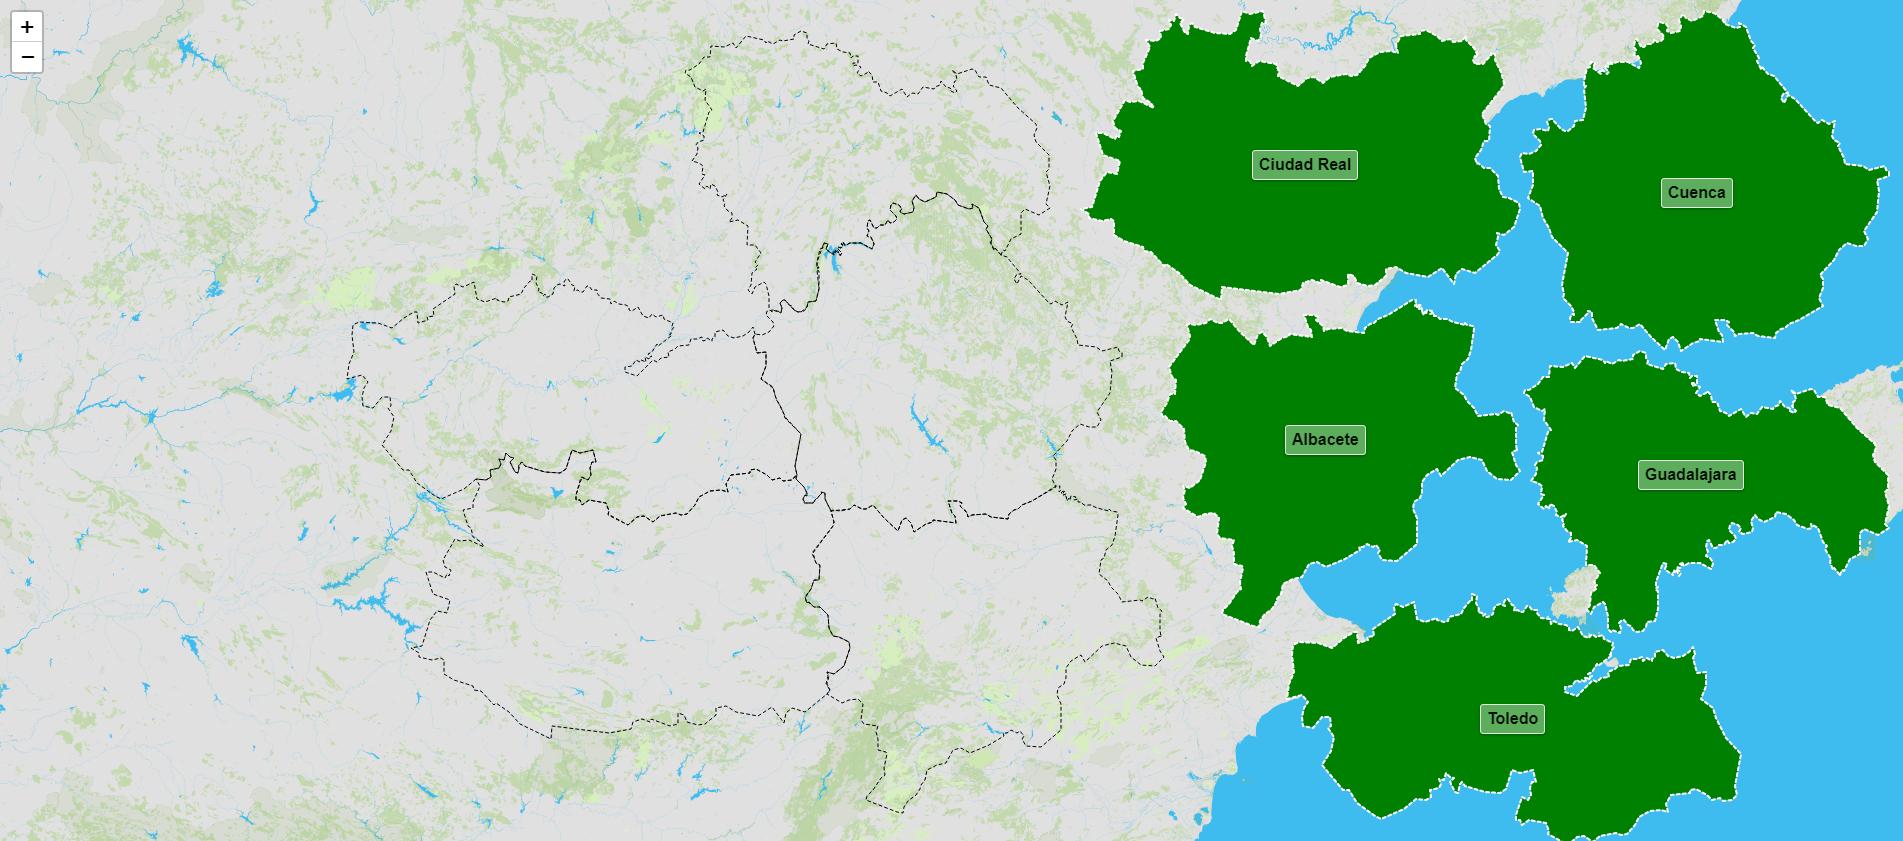 Provincias de Castilla-La Mancha